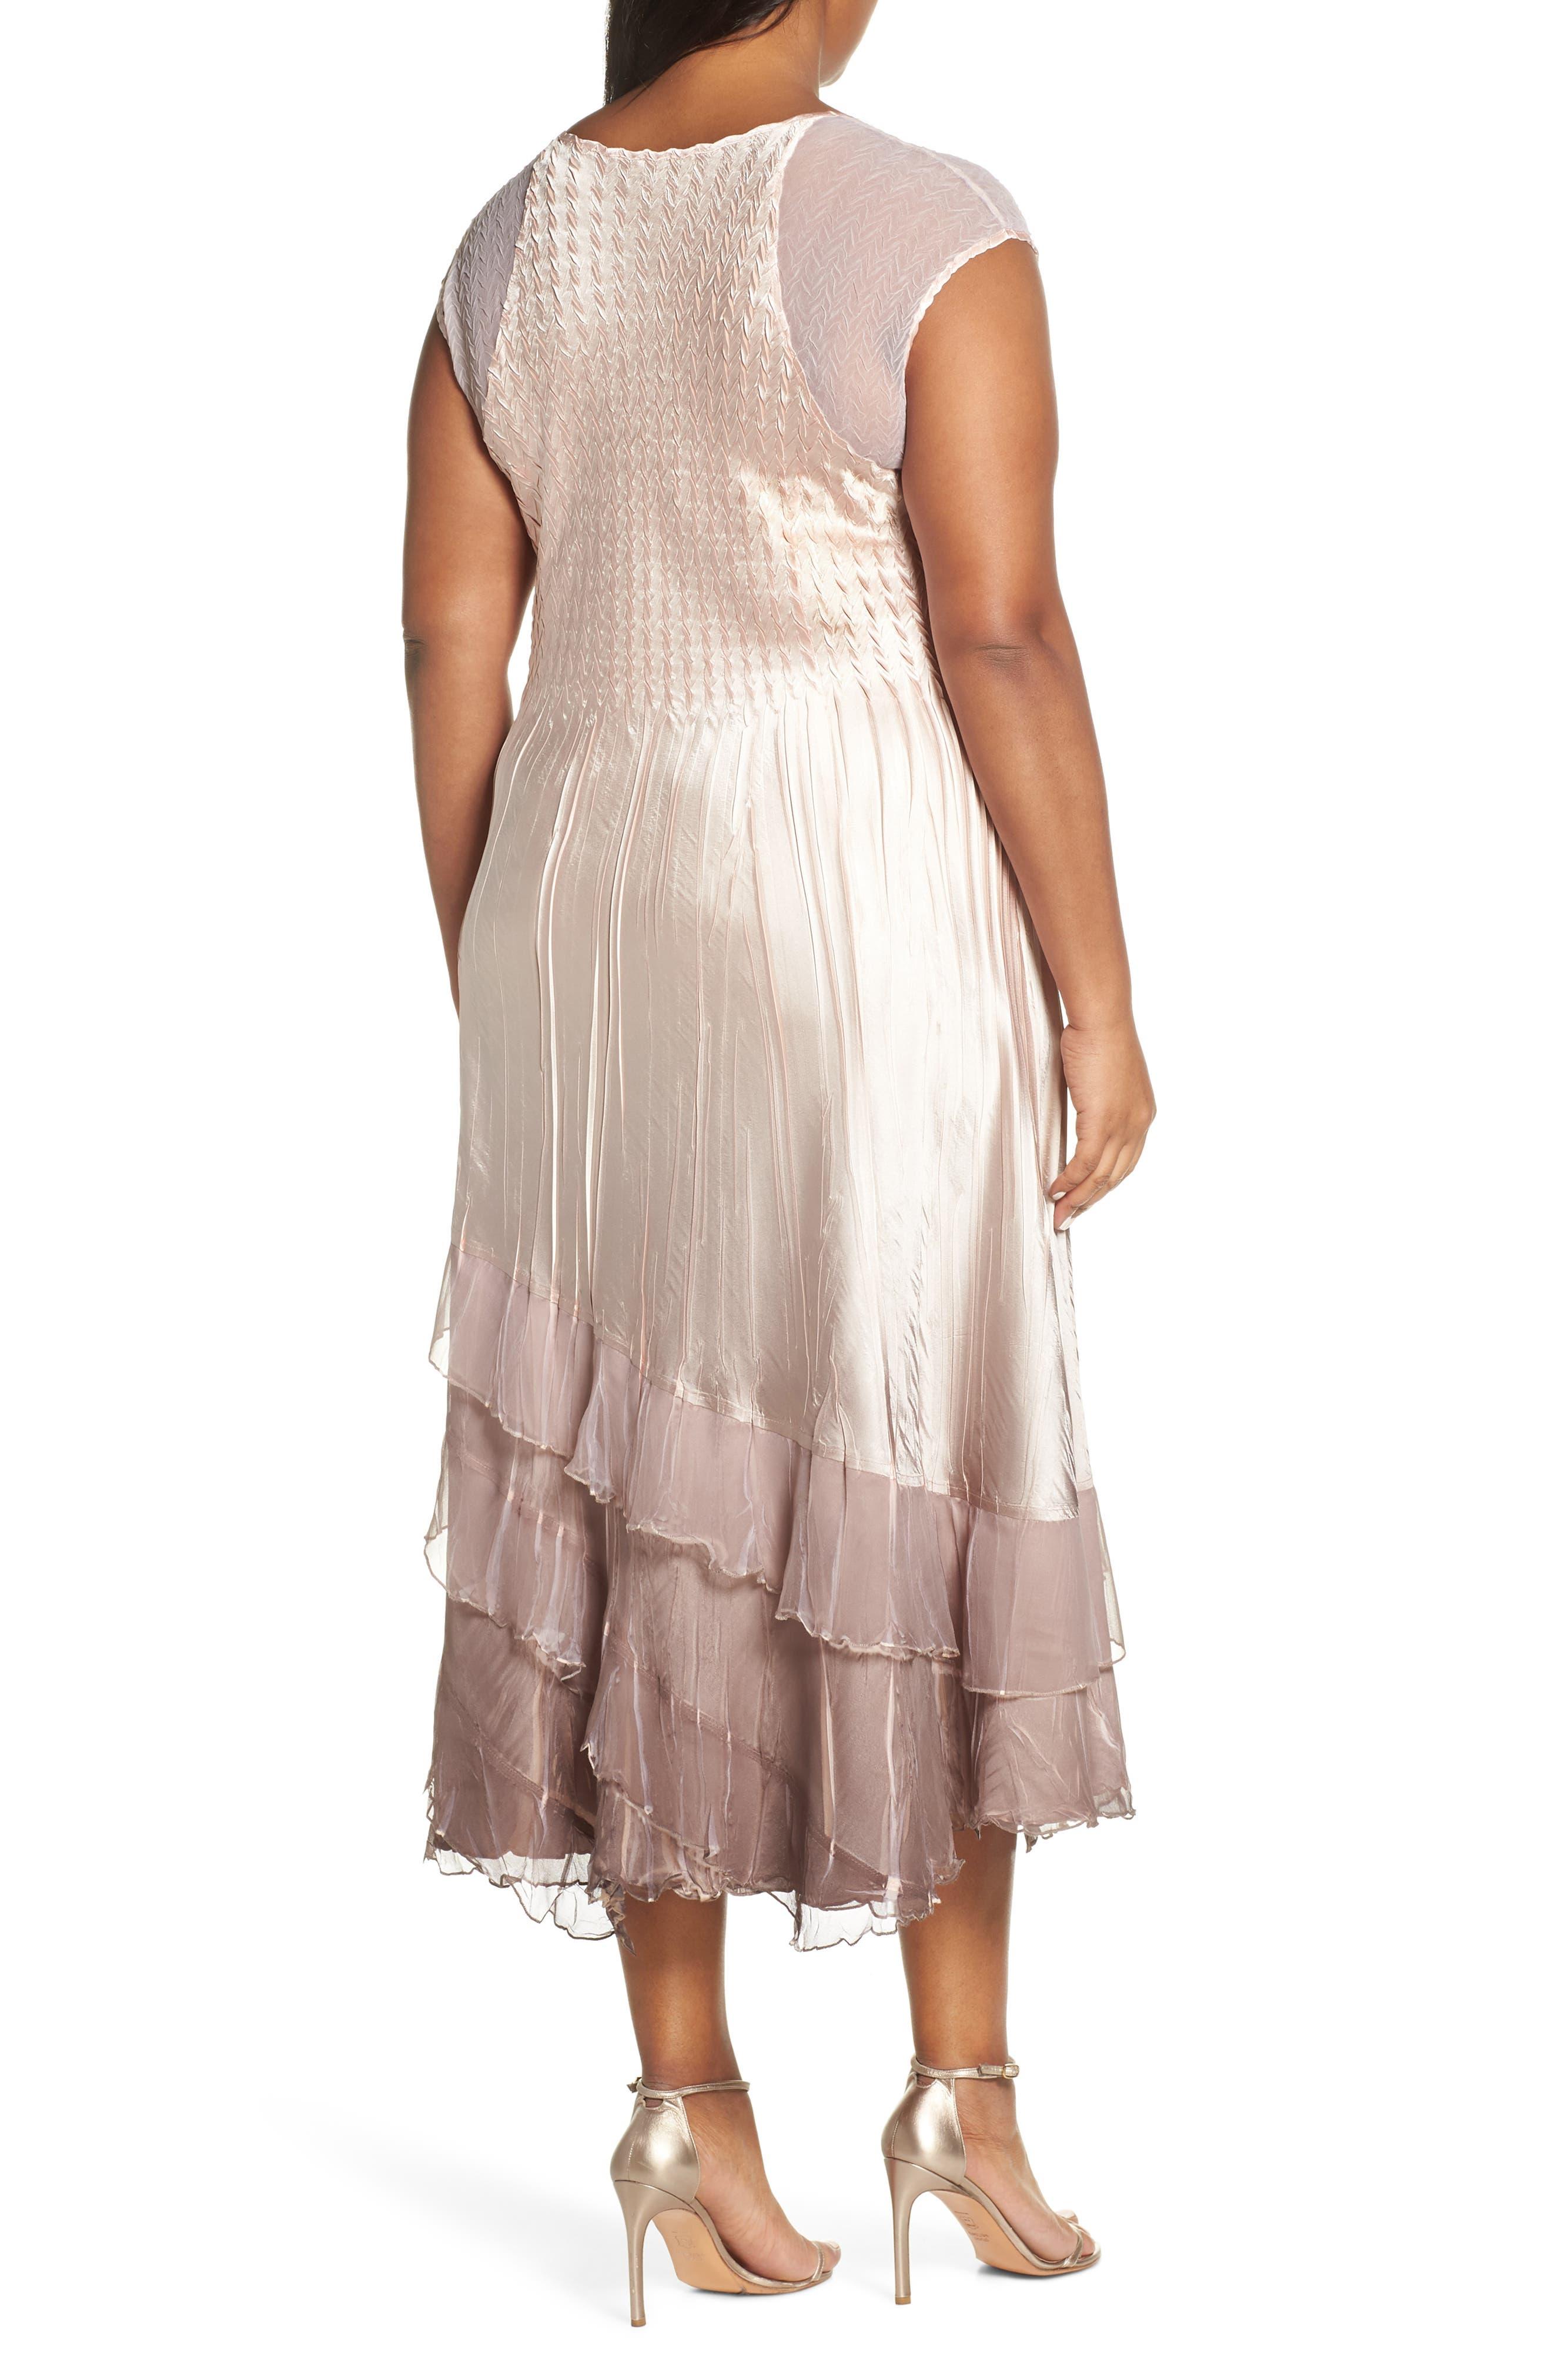 KOMAROV,                             Tiered Hem Ombré Dress with Jacket,                             Alternate thumbnail 5, color,                             VINTAGE ROSE WITH CAFE OMBRE